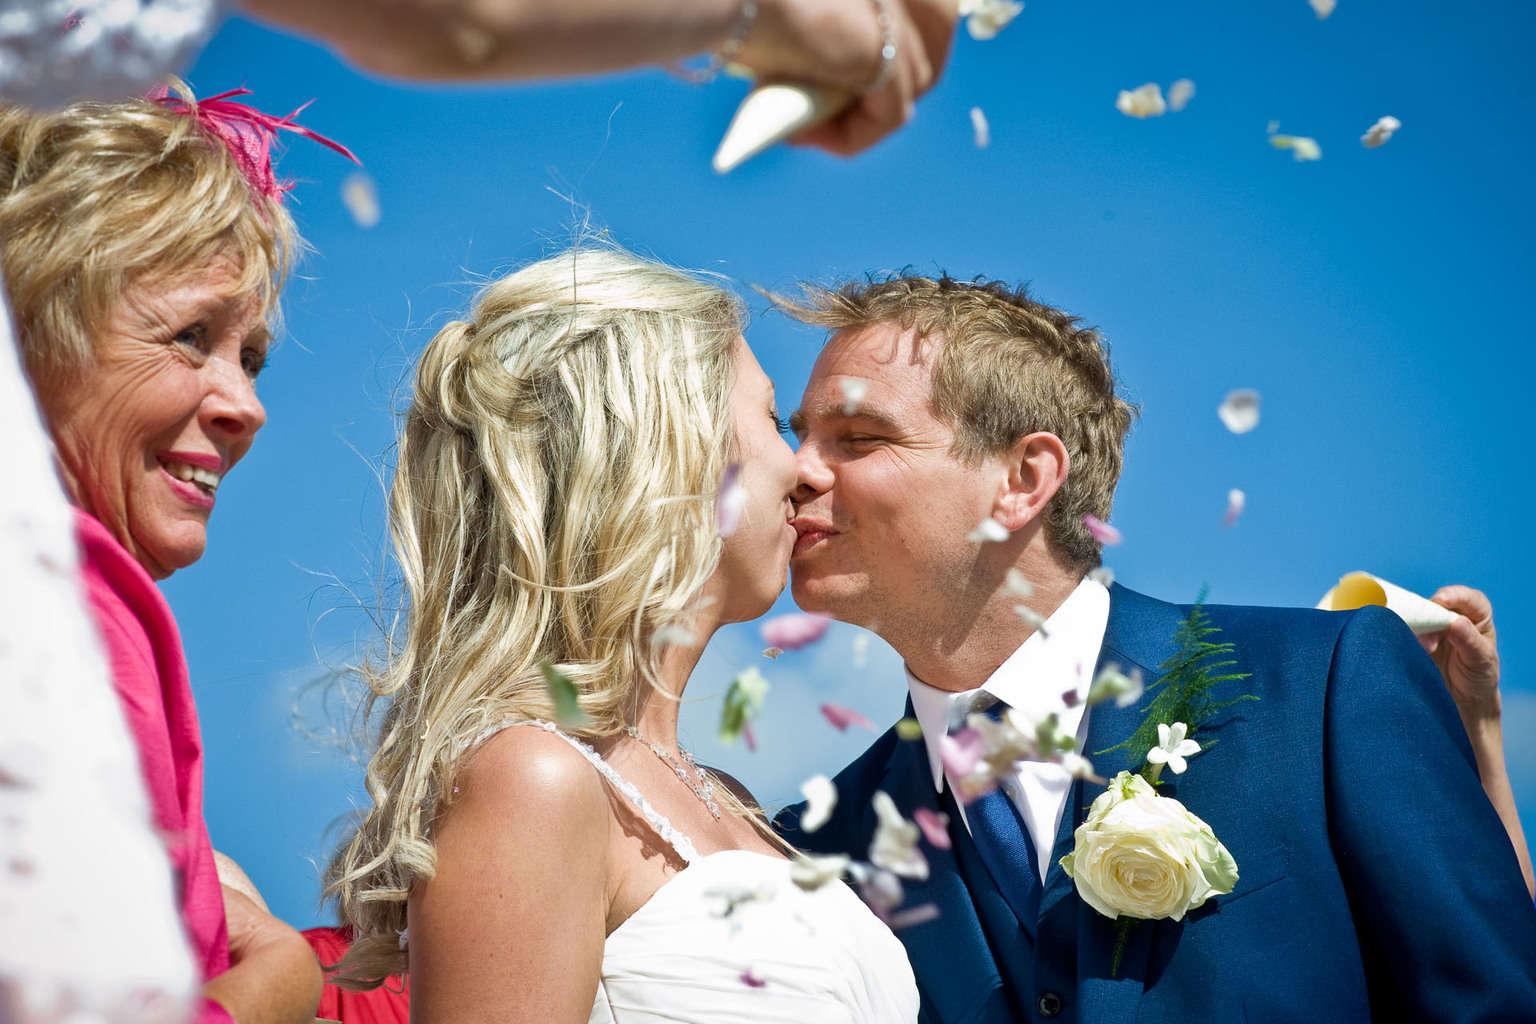 FJB Hotel wedding photographer poole